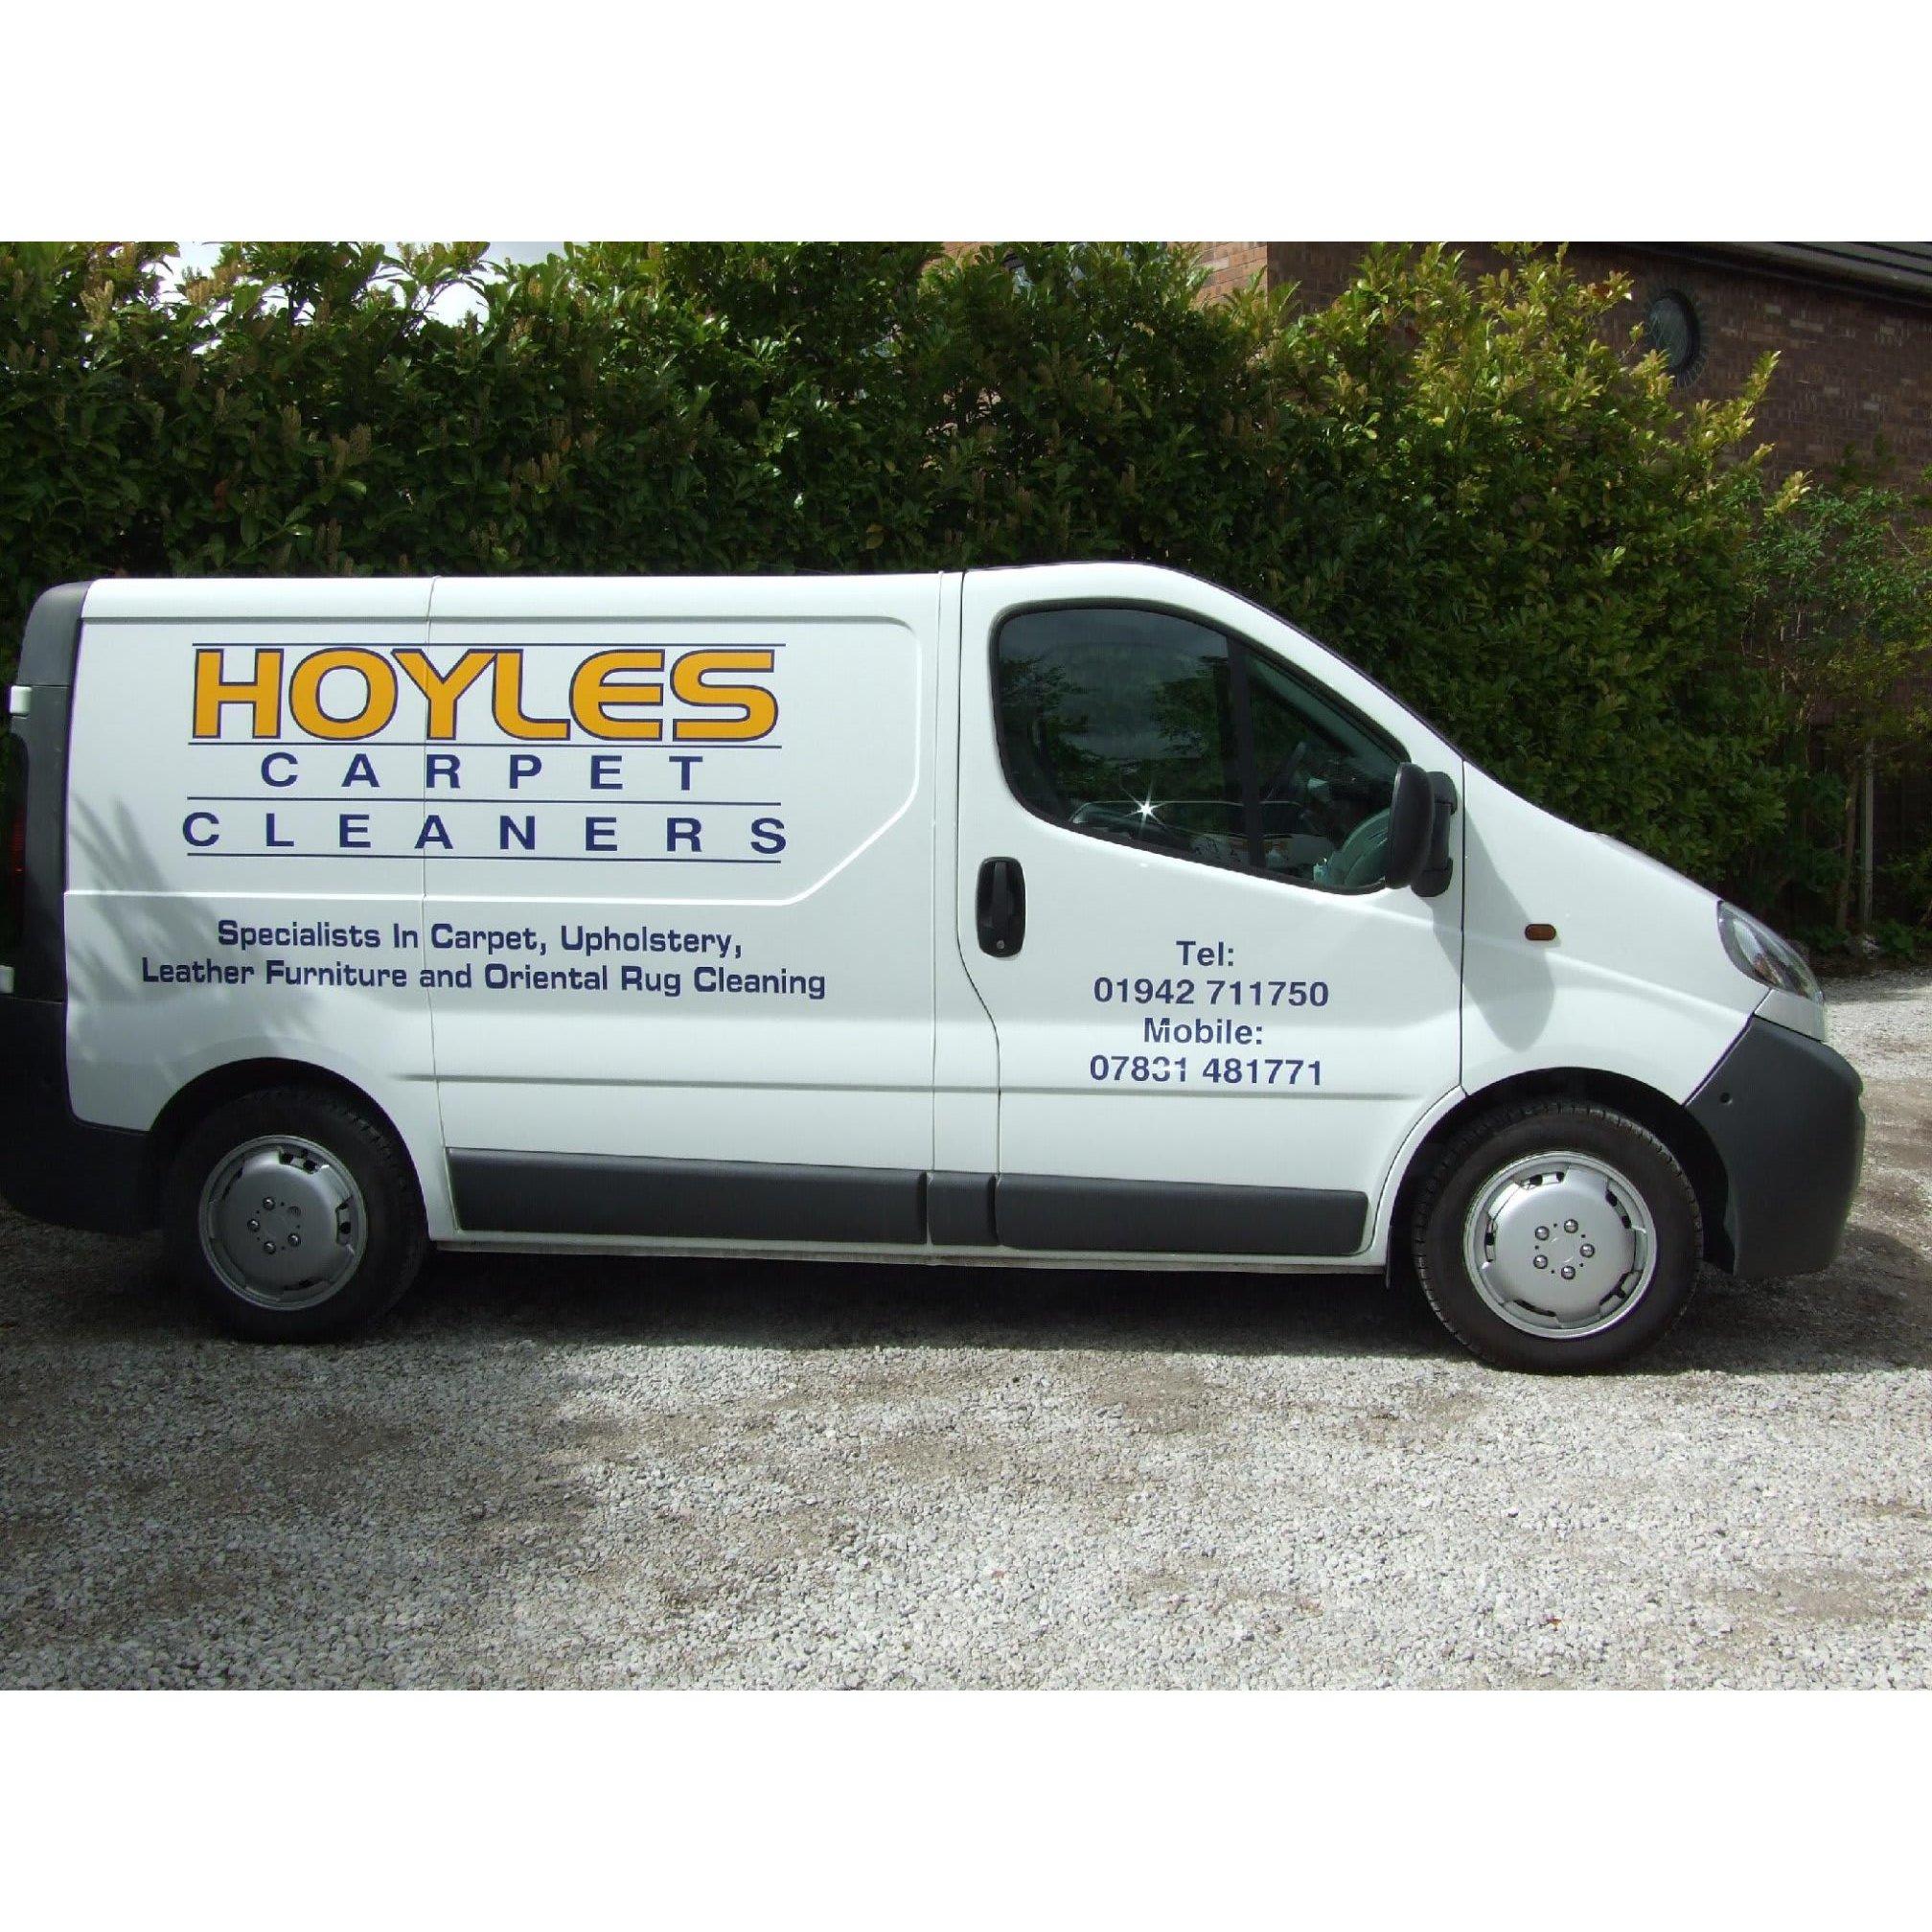 Hoyles Carpet & Upholstery Cleaners - Warrington, Lancashire WA3 2SD - 01942 711750 | ShowMeLocal.com